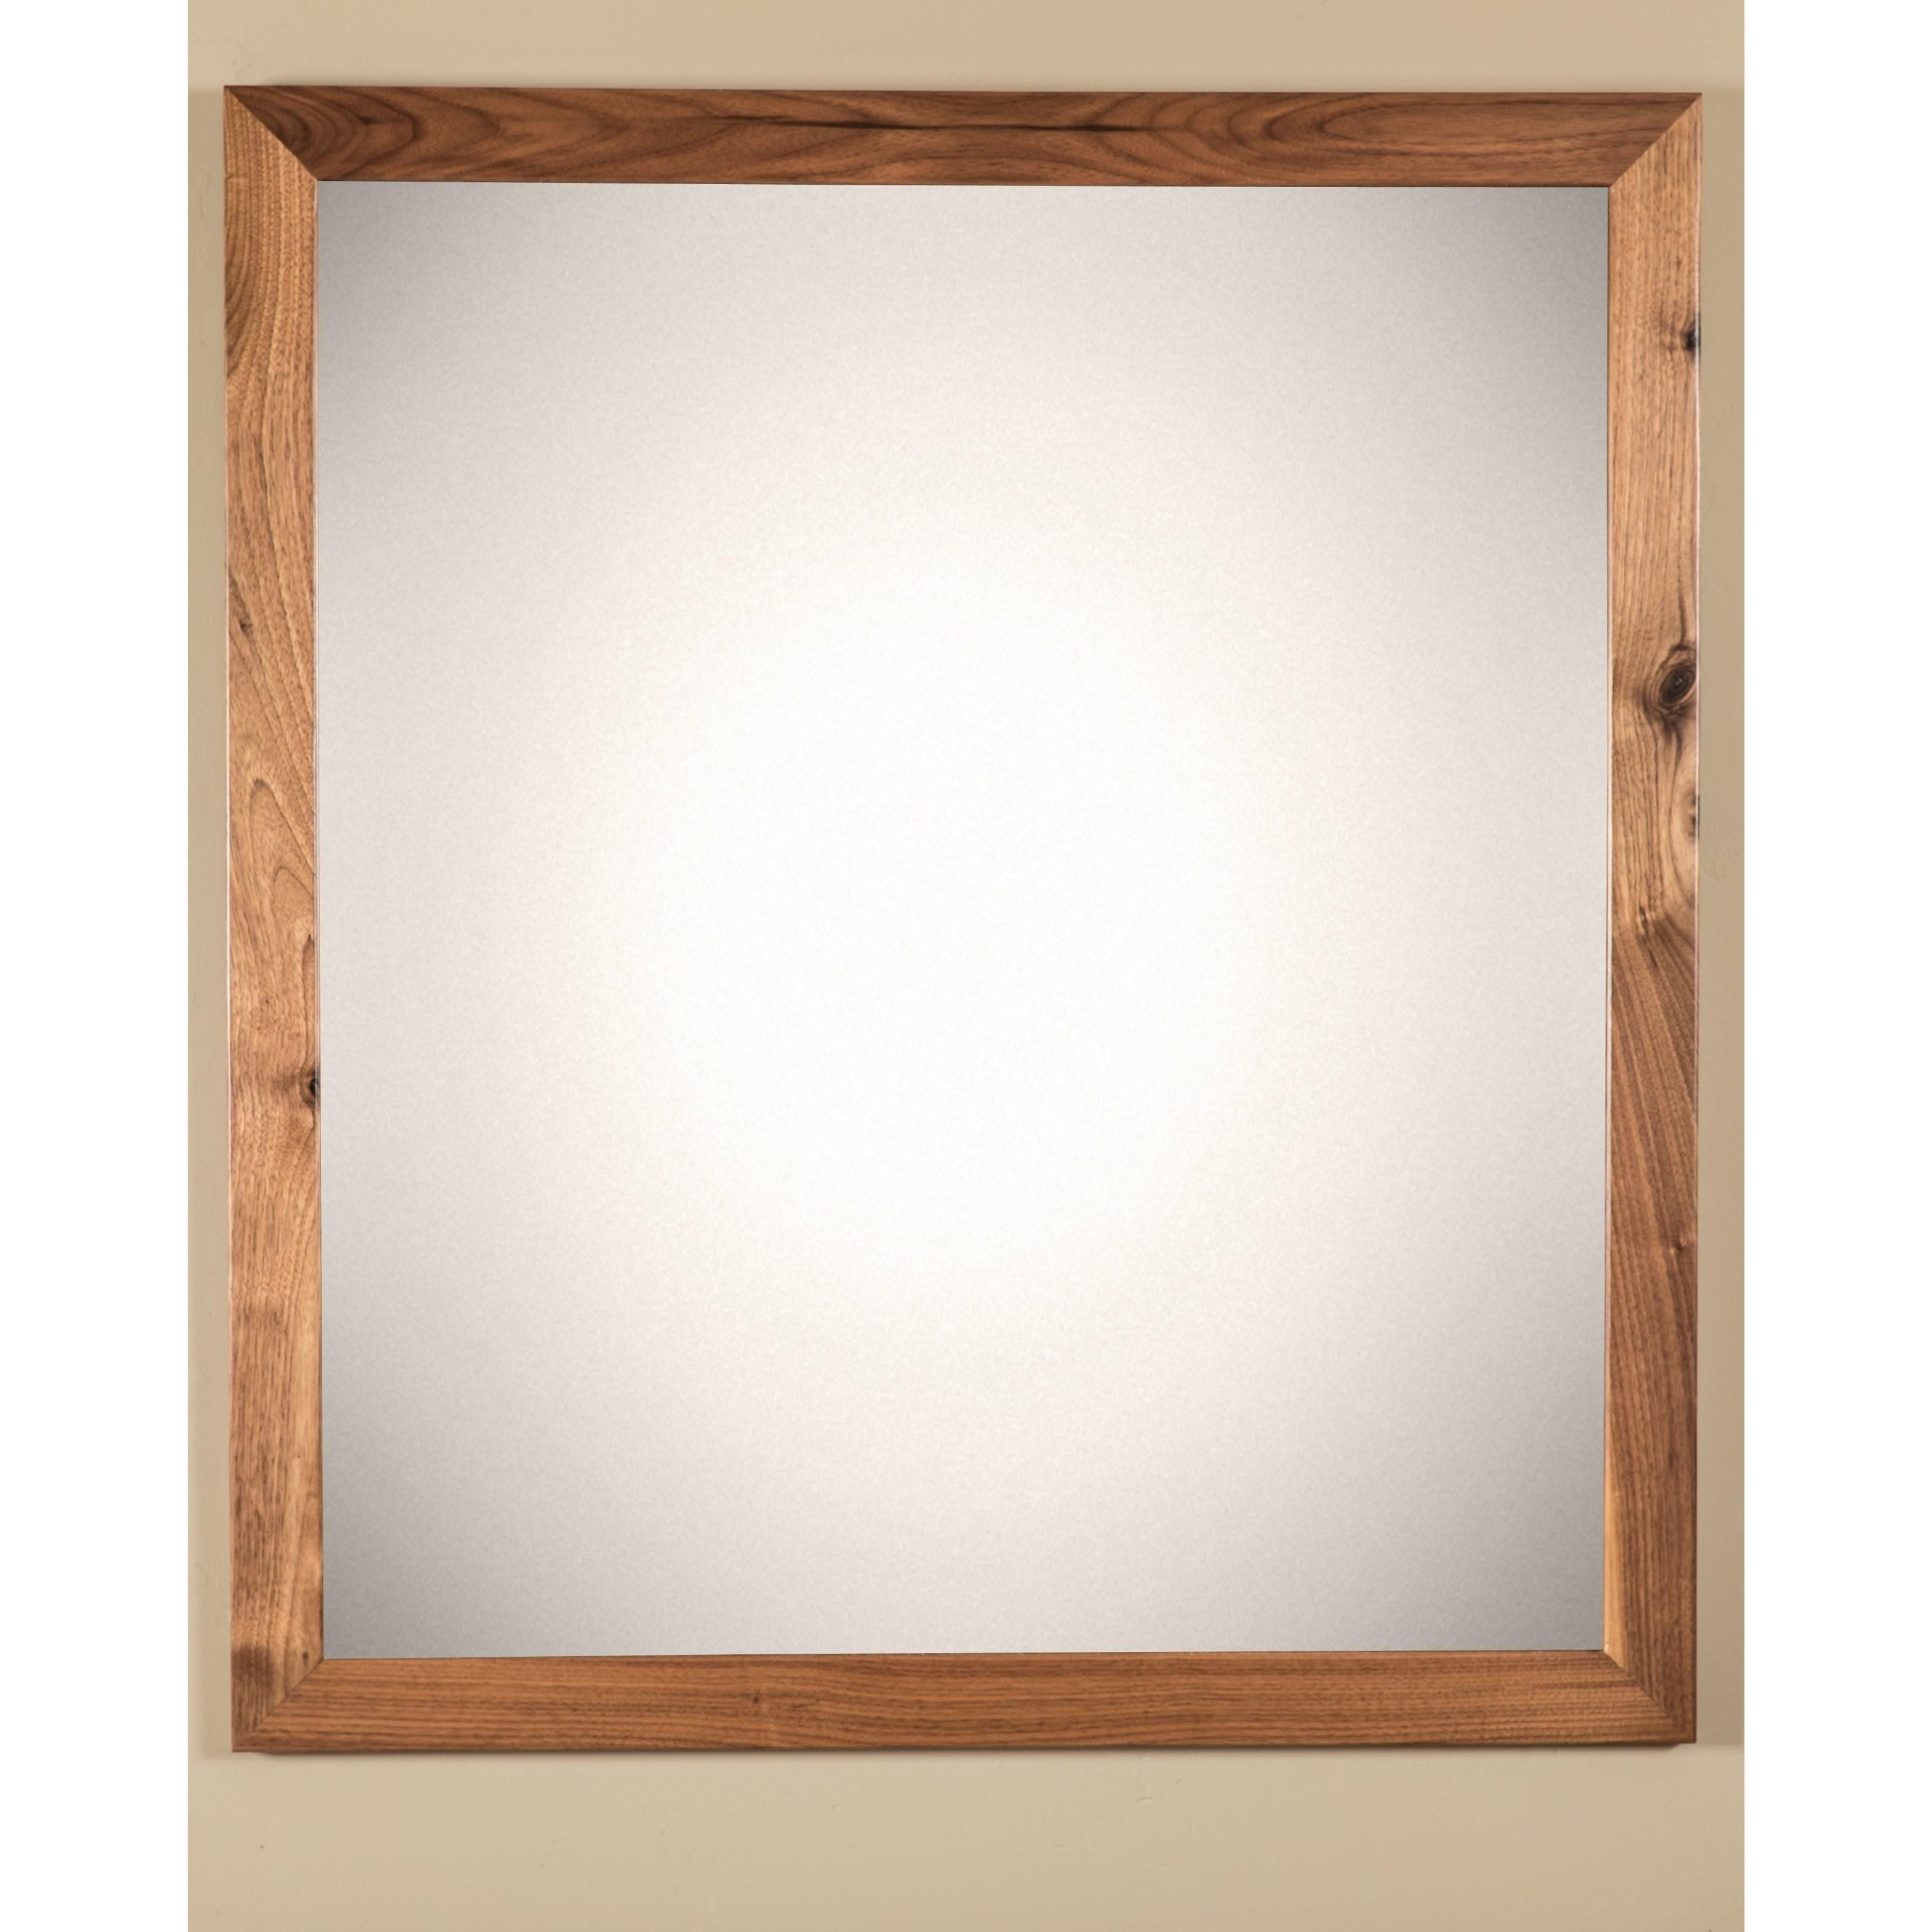 Sullivan Lake Customizable Mirror by Glenmont Furniture at Saugerties Furniture Mart